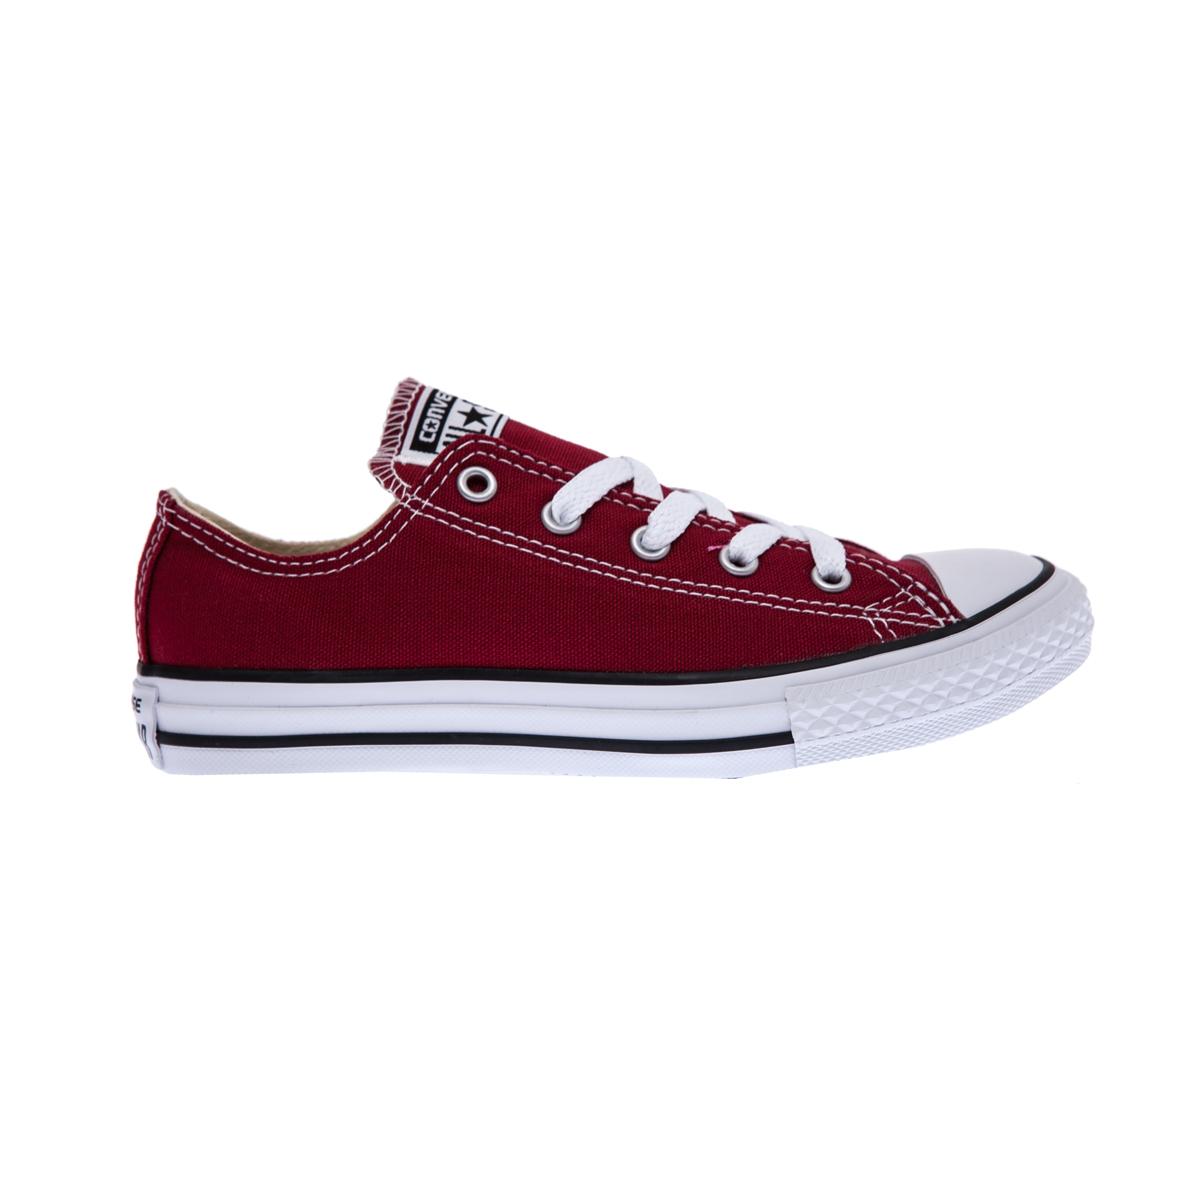 CONVERSE – Παιδικά παπούτσια Chuck Taylor μπορντώ